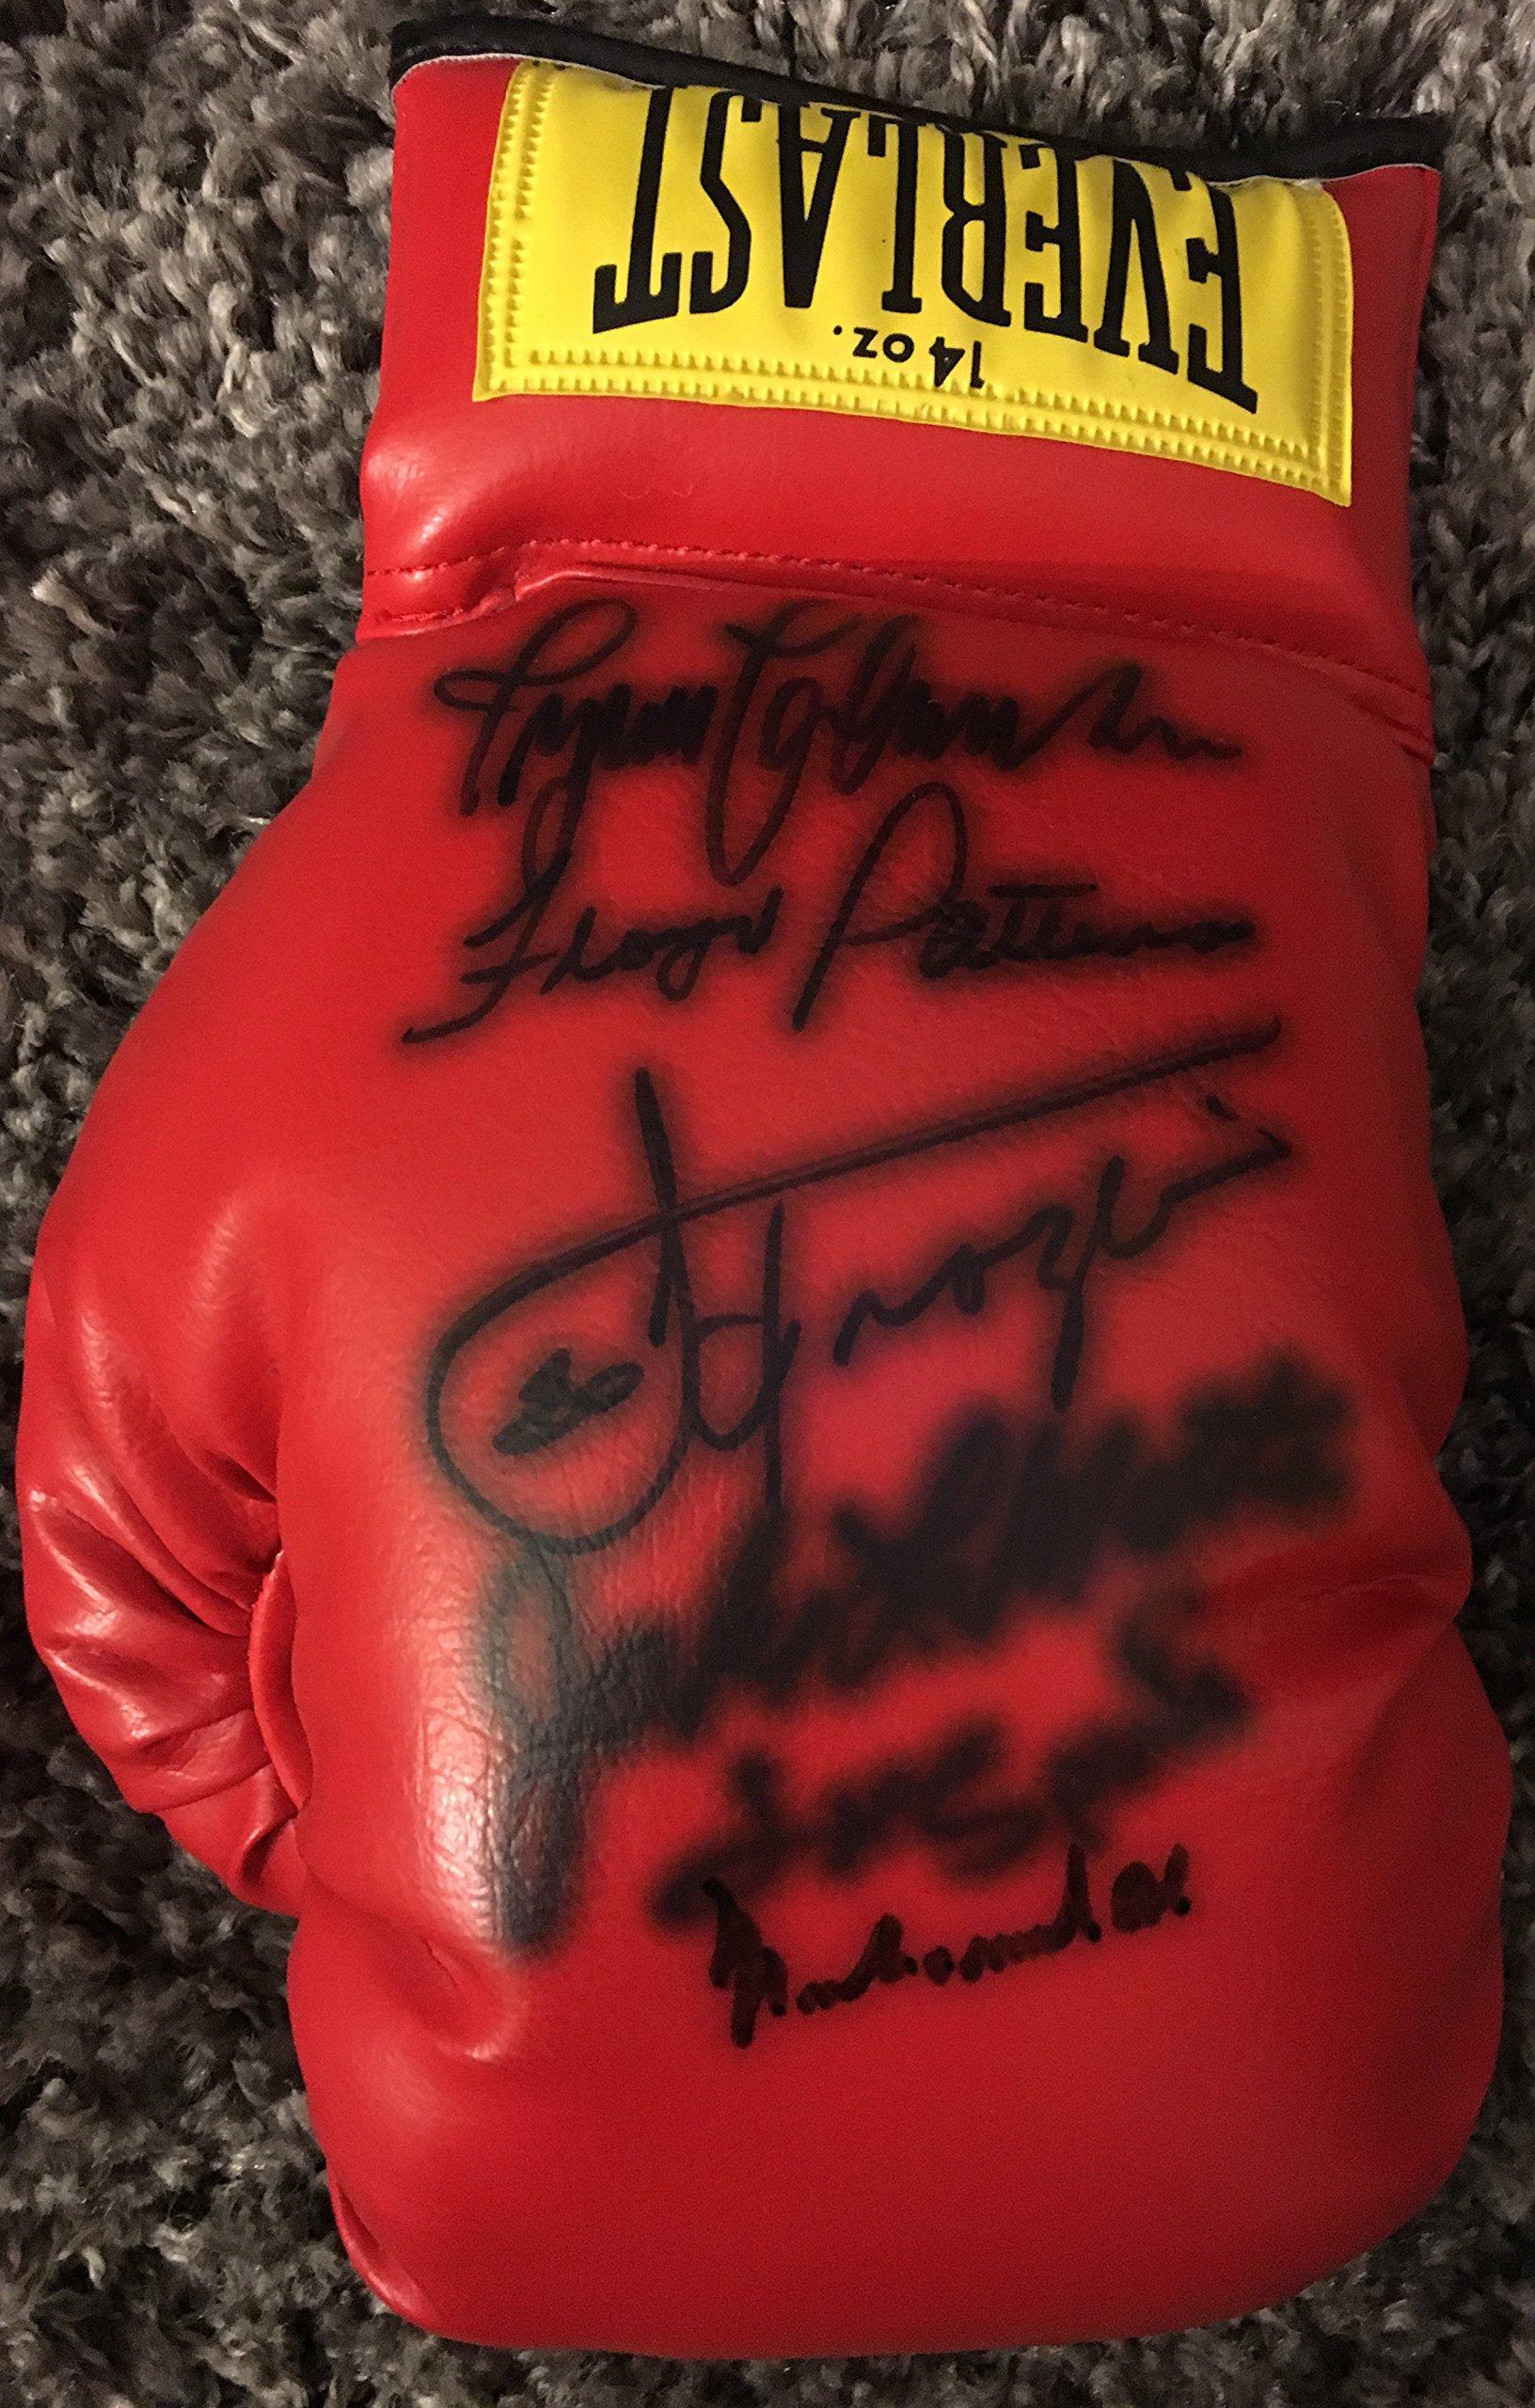 MUHAMMAD ALI, JOE FRAZIER, LEON SPINKS, FLOYD PATTERSON, INGEMAR JOHANSSON & JAKE LAMOTTA Signed Everlast Boxing Glove PSA/DNA LOA